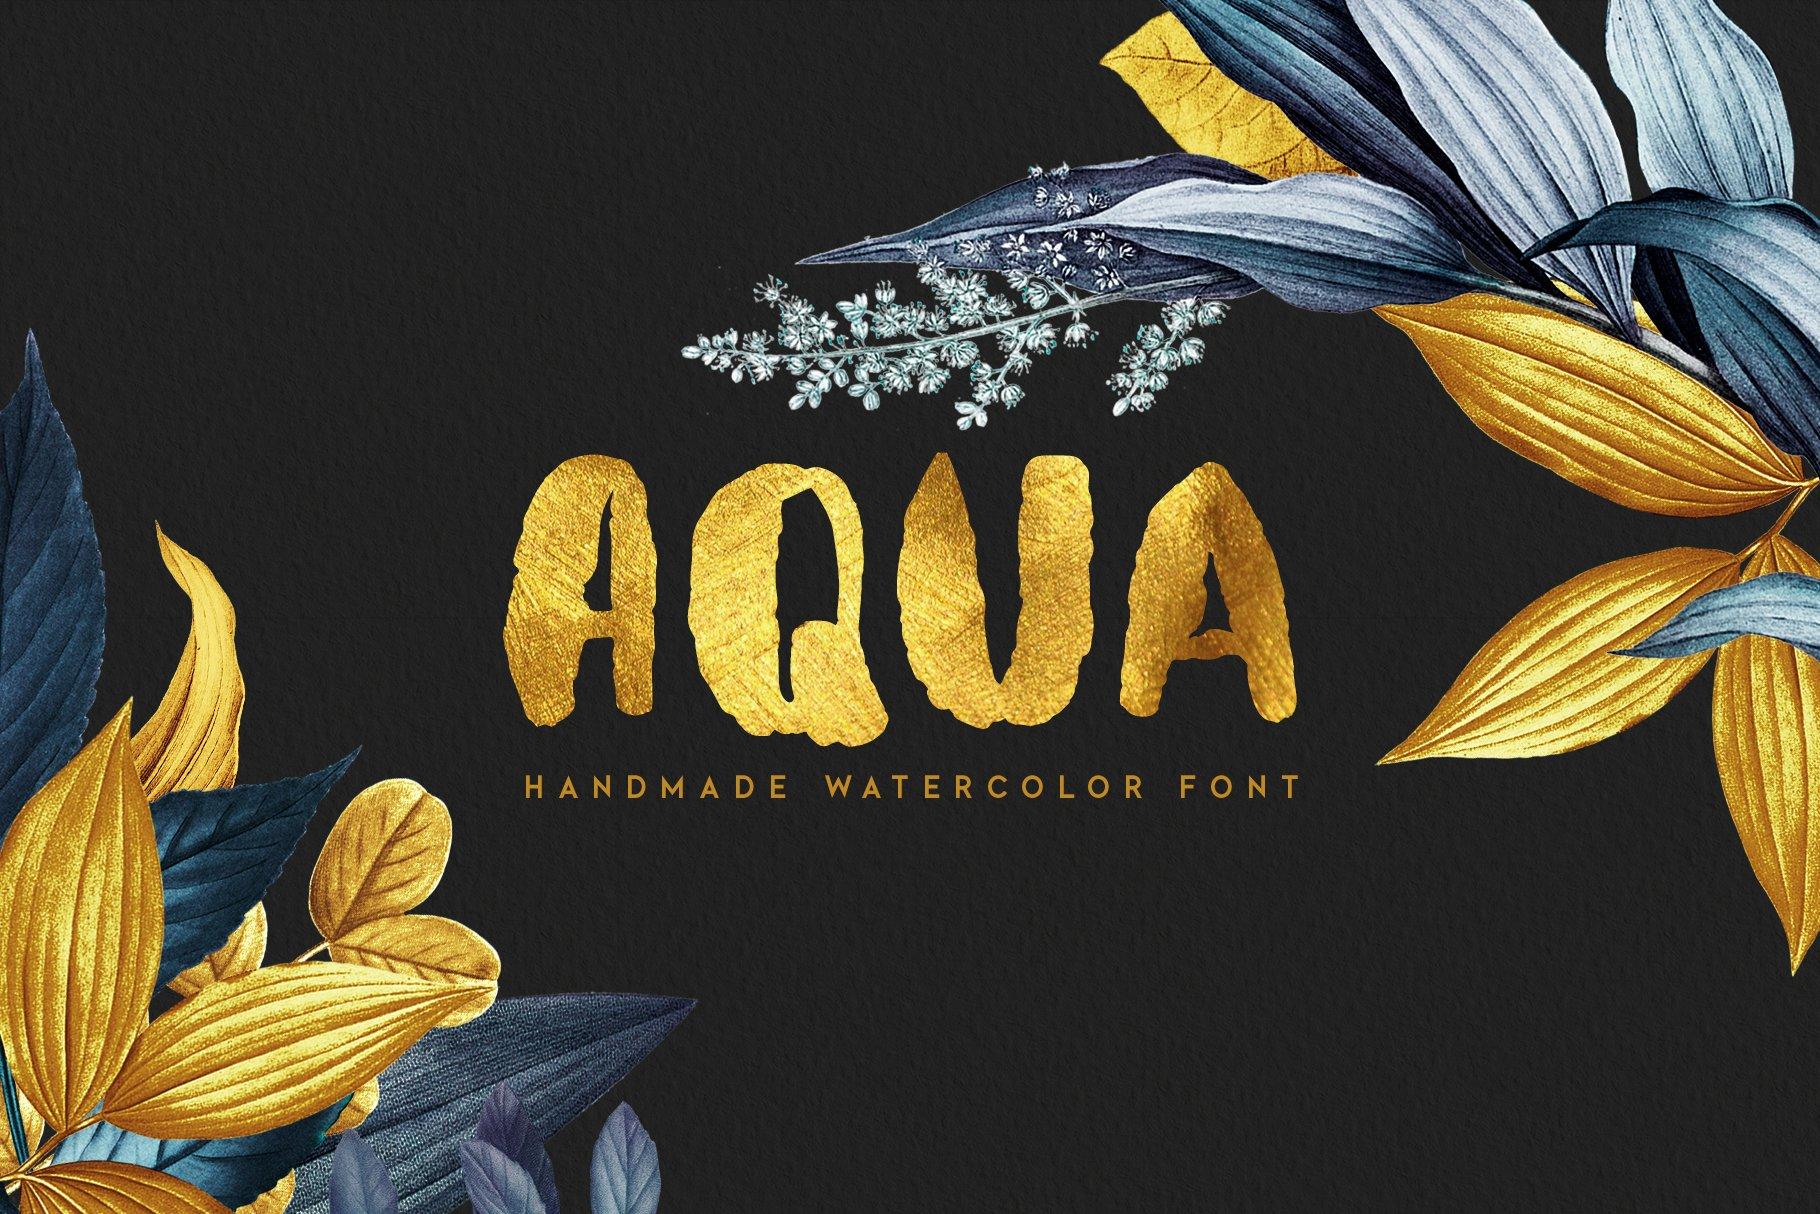 Aquatype. Display Watercolor font. example image 1